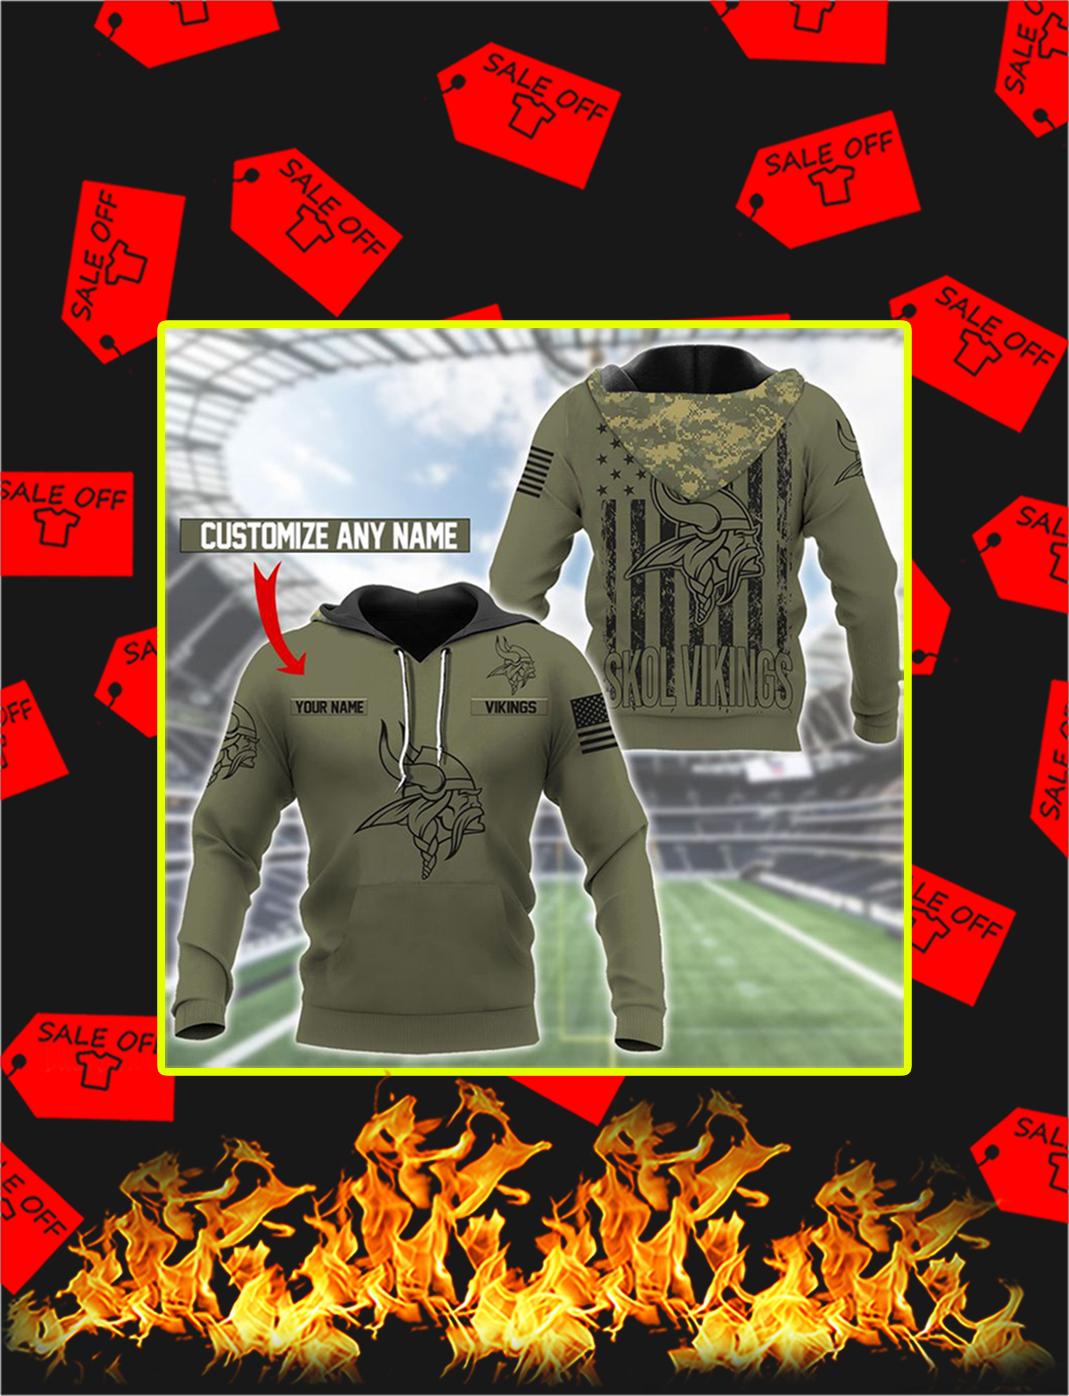 Minnesota Vikings Custom Name Personalize Hoodie - L